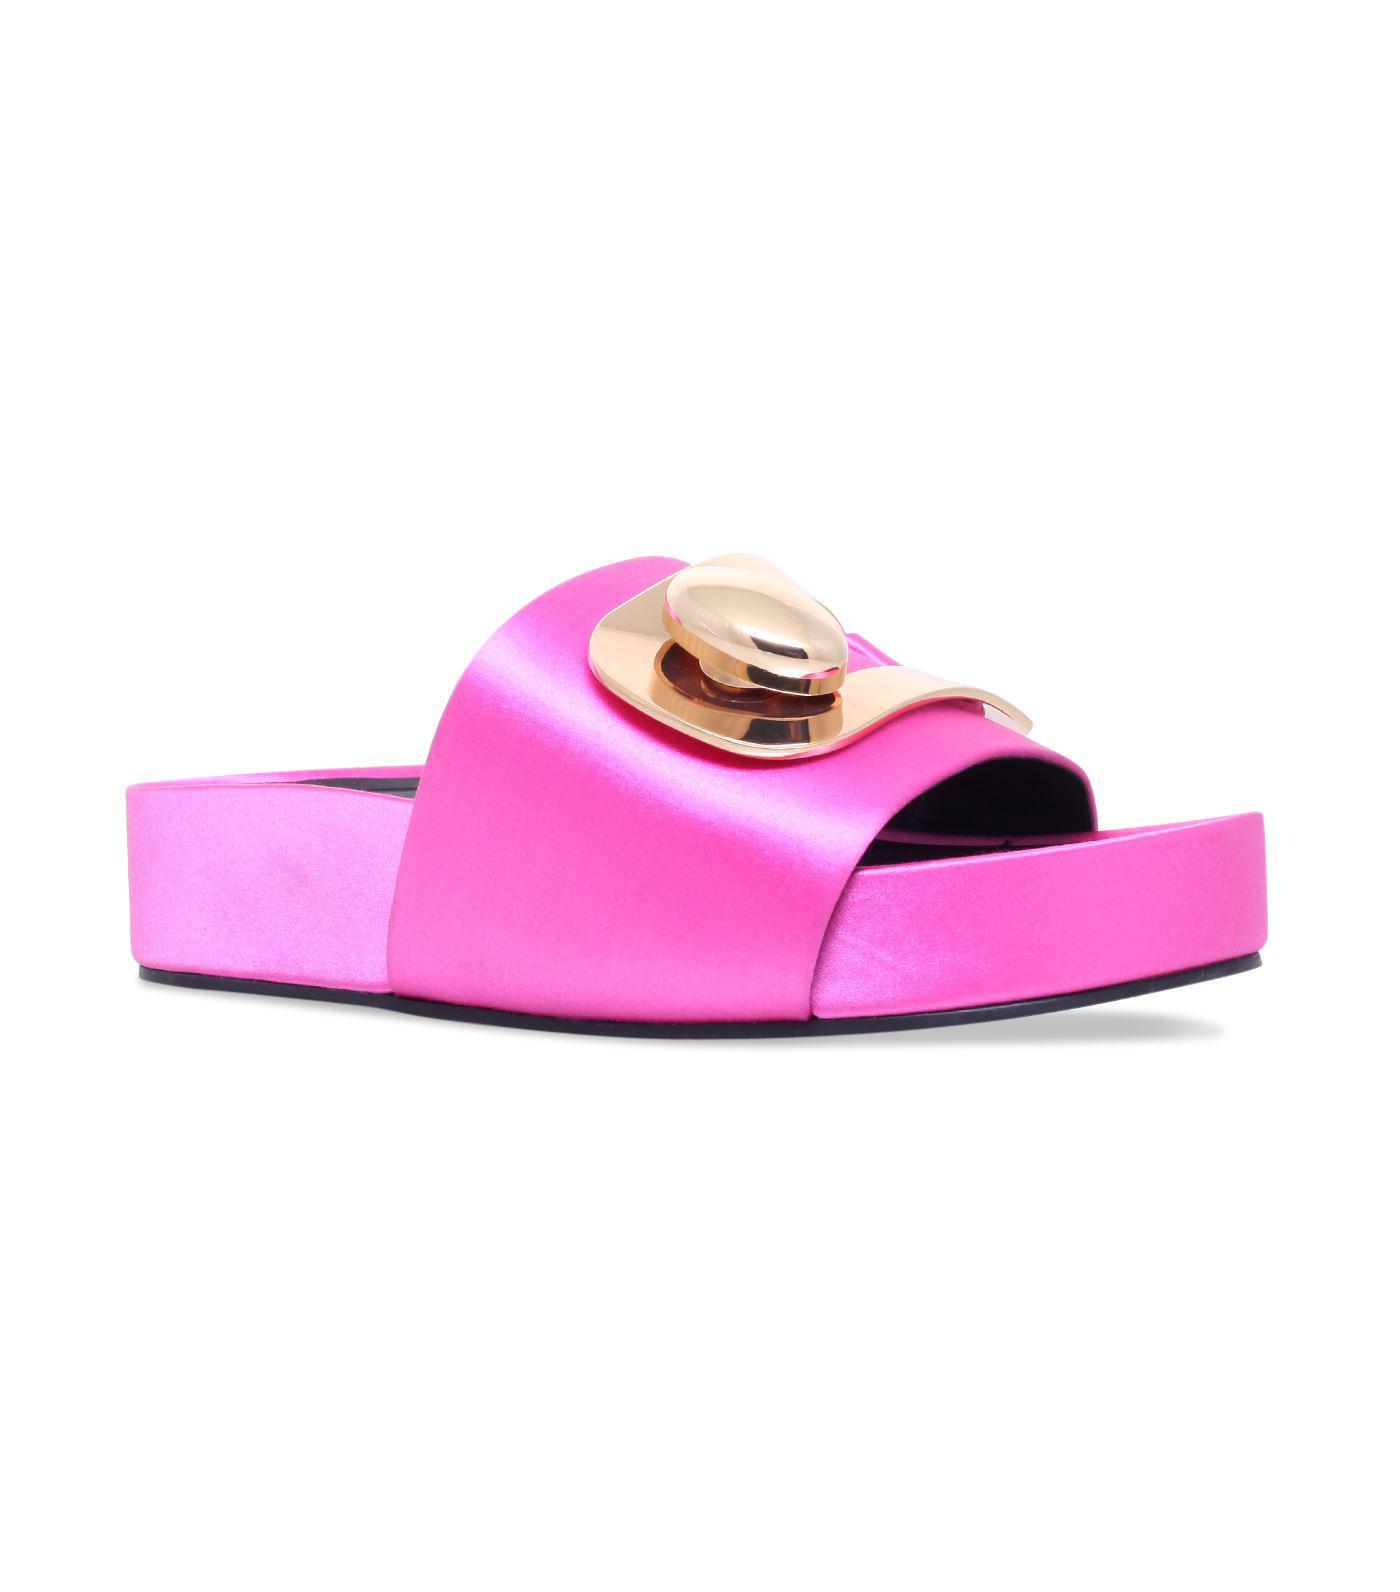 buckle platform slides - Pink & Purple Stella Luna Fd72u